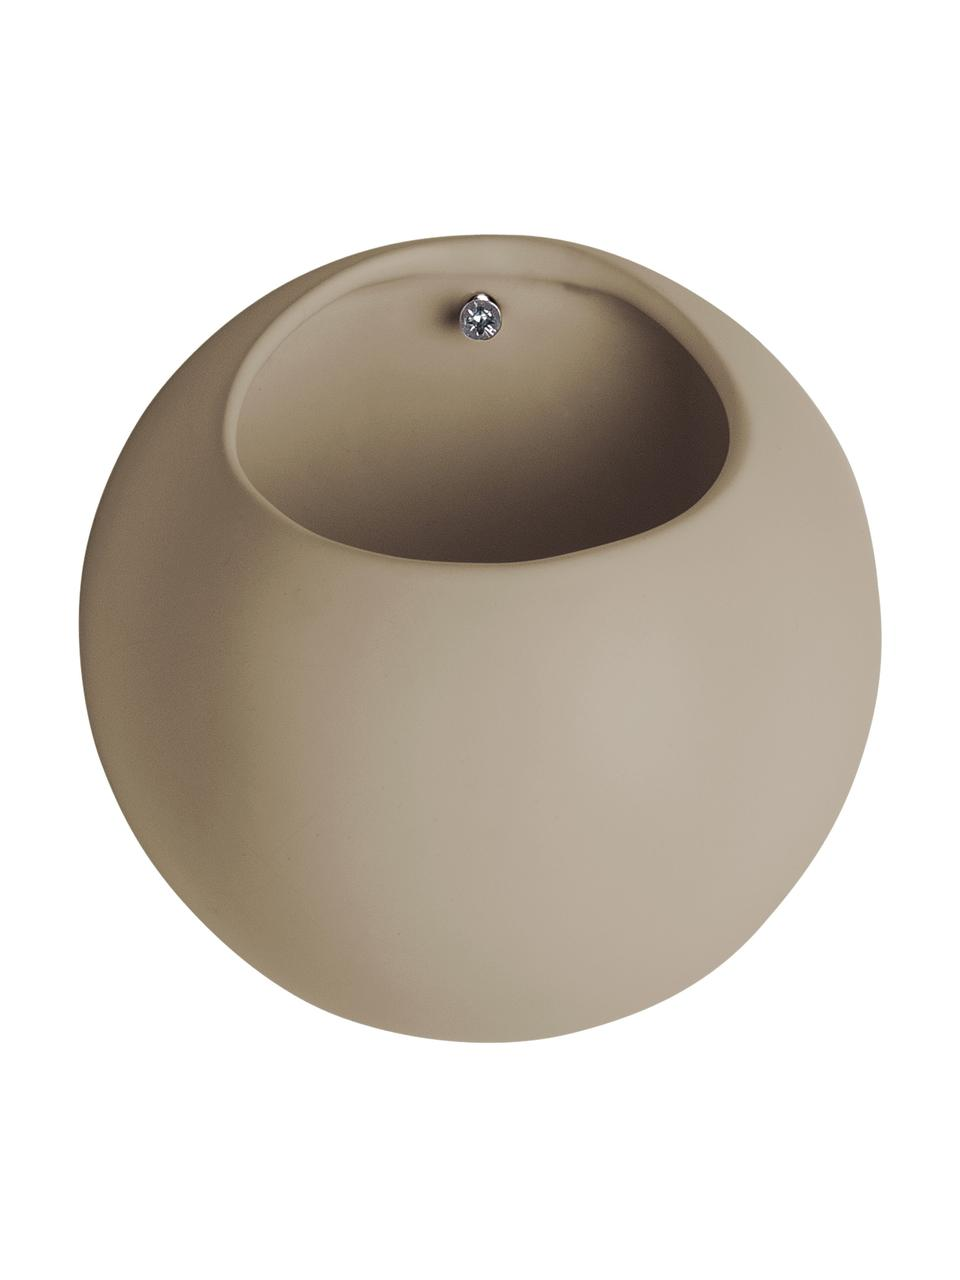 Kleiner Wand-Übertopf Globe aus Keramik, Keramik, Beige, Ø 15 x H 10 cm